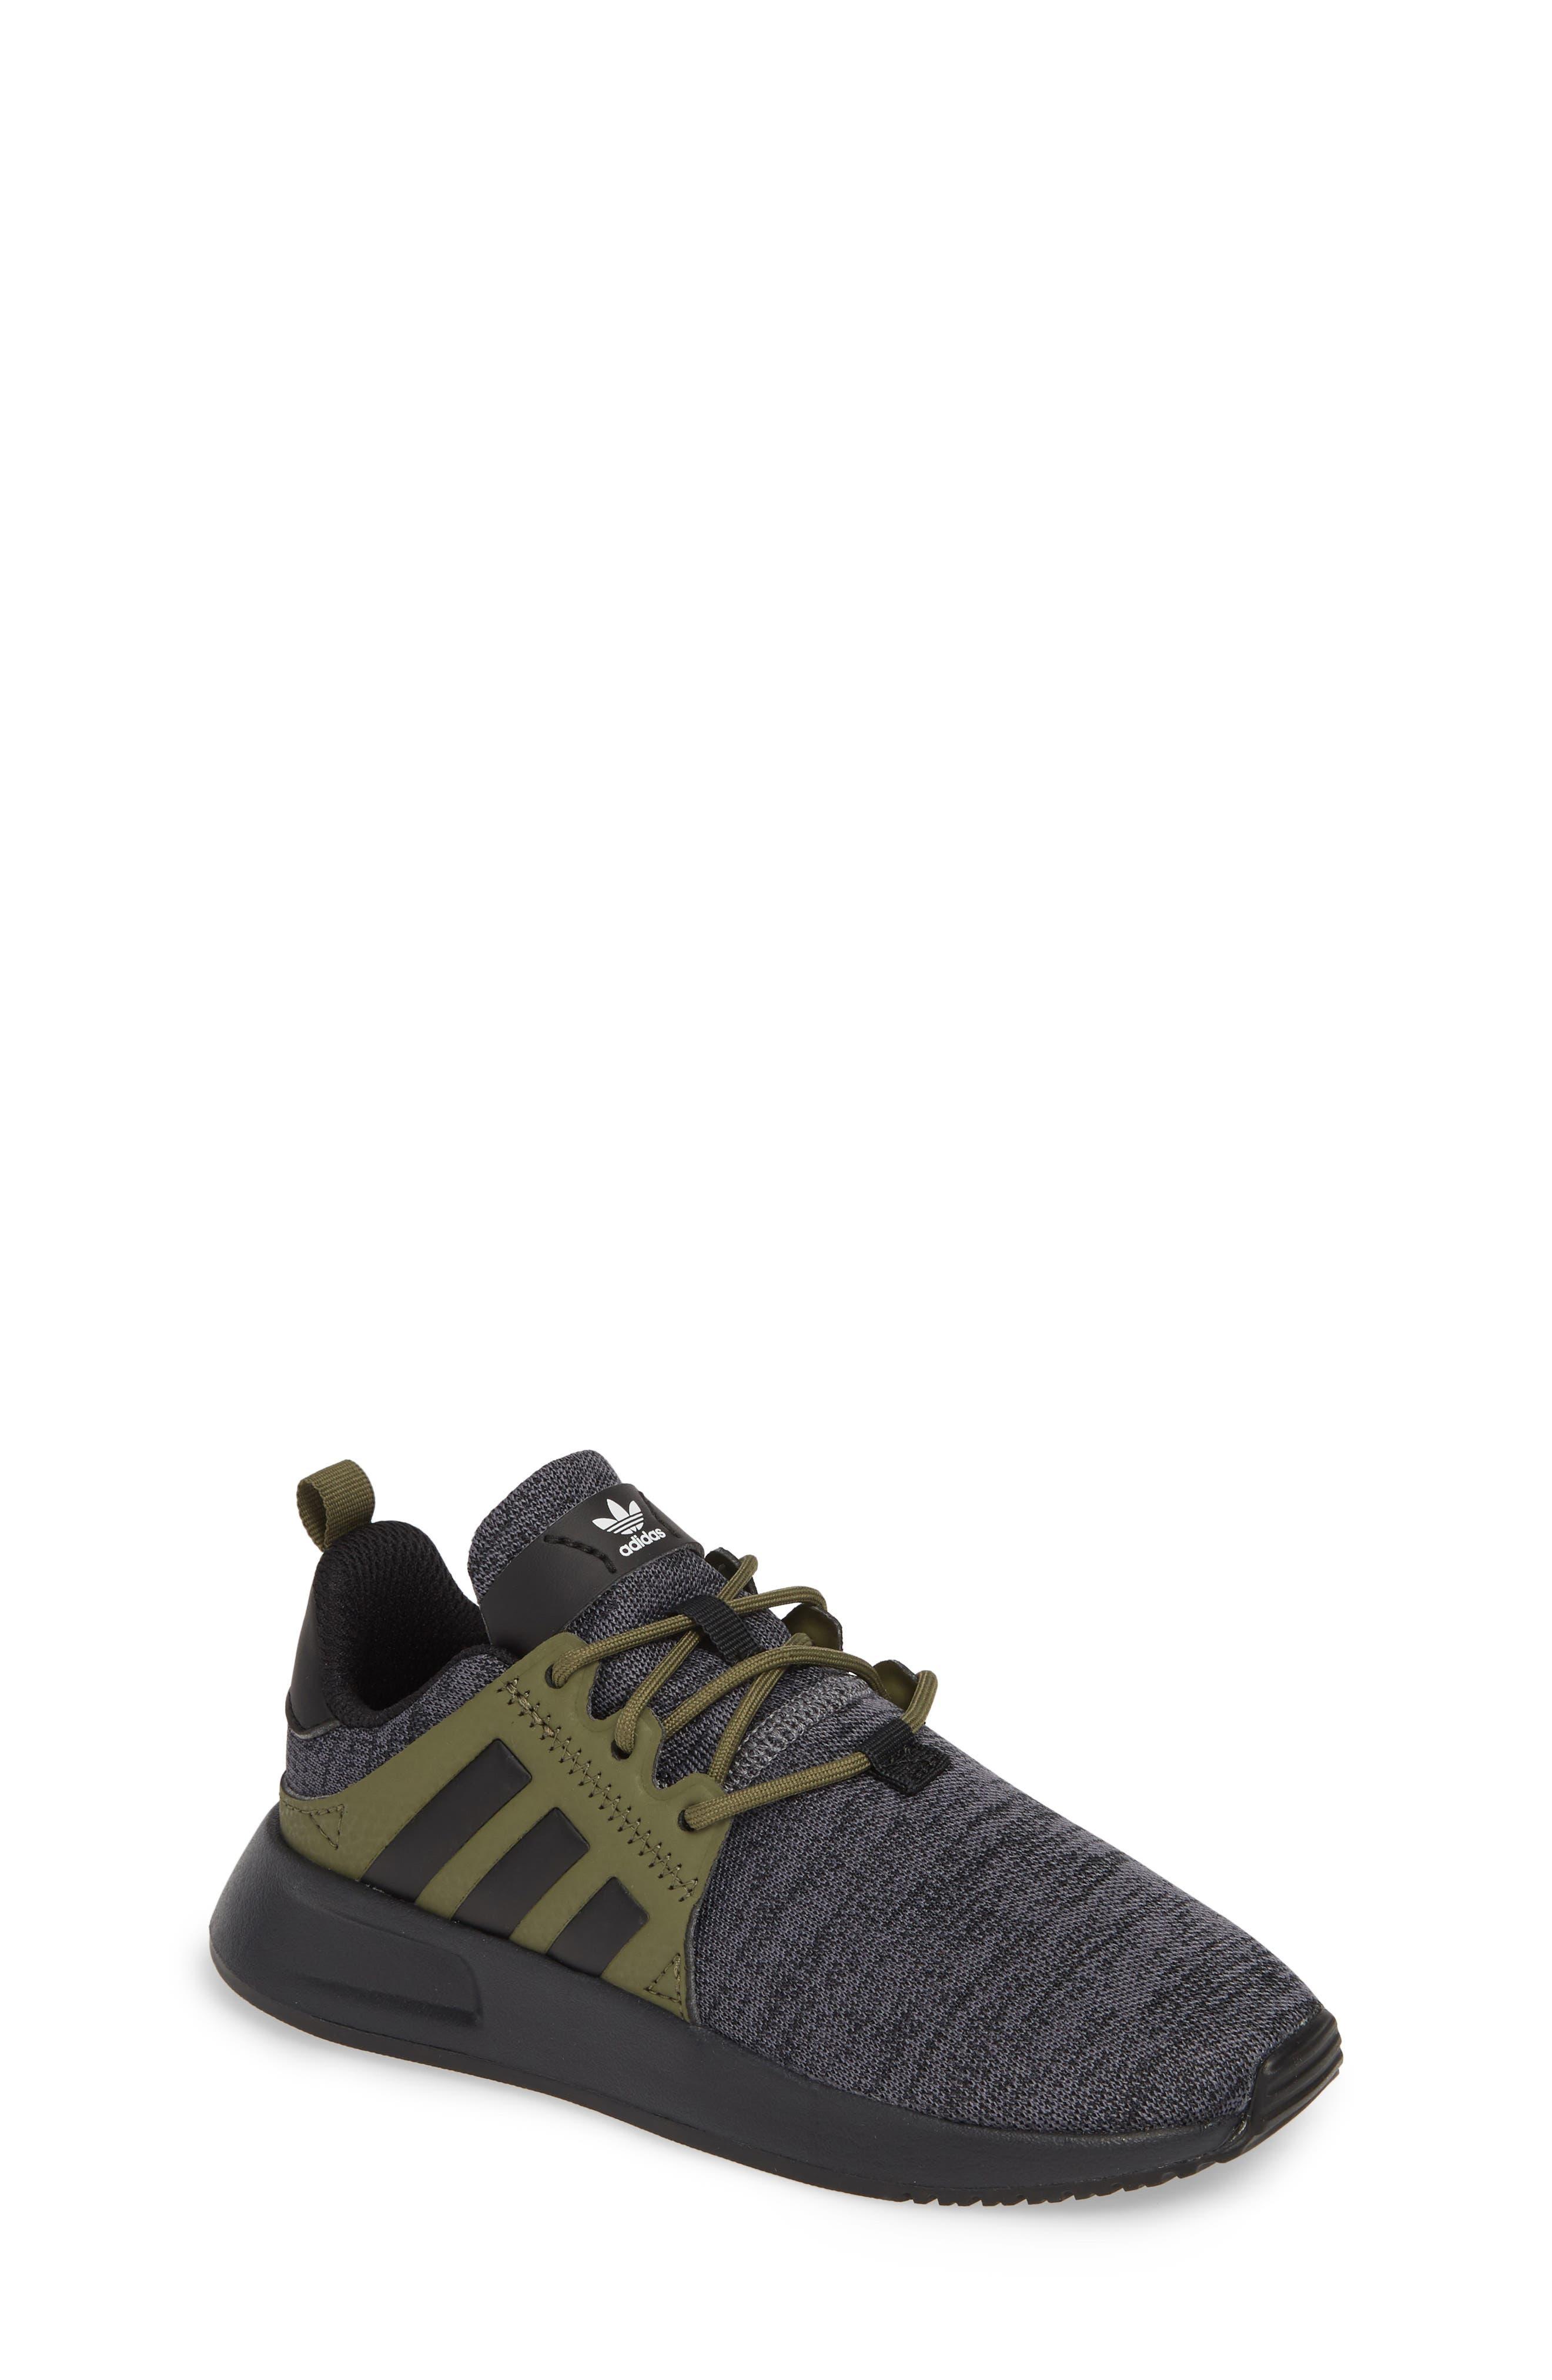 Toddler Adidas X Plr Sneaker Size 105 M  Grey